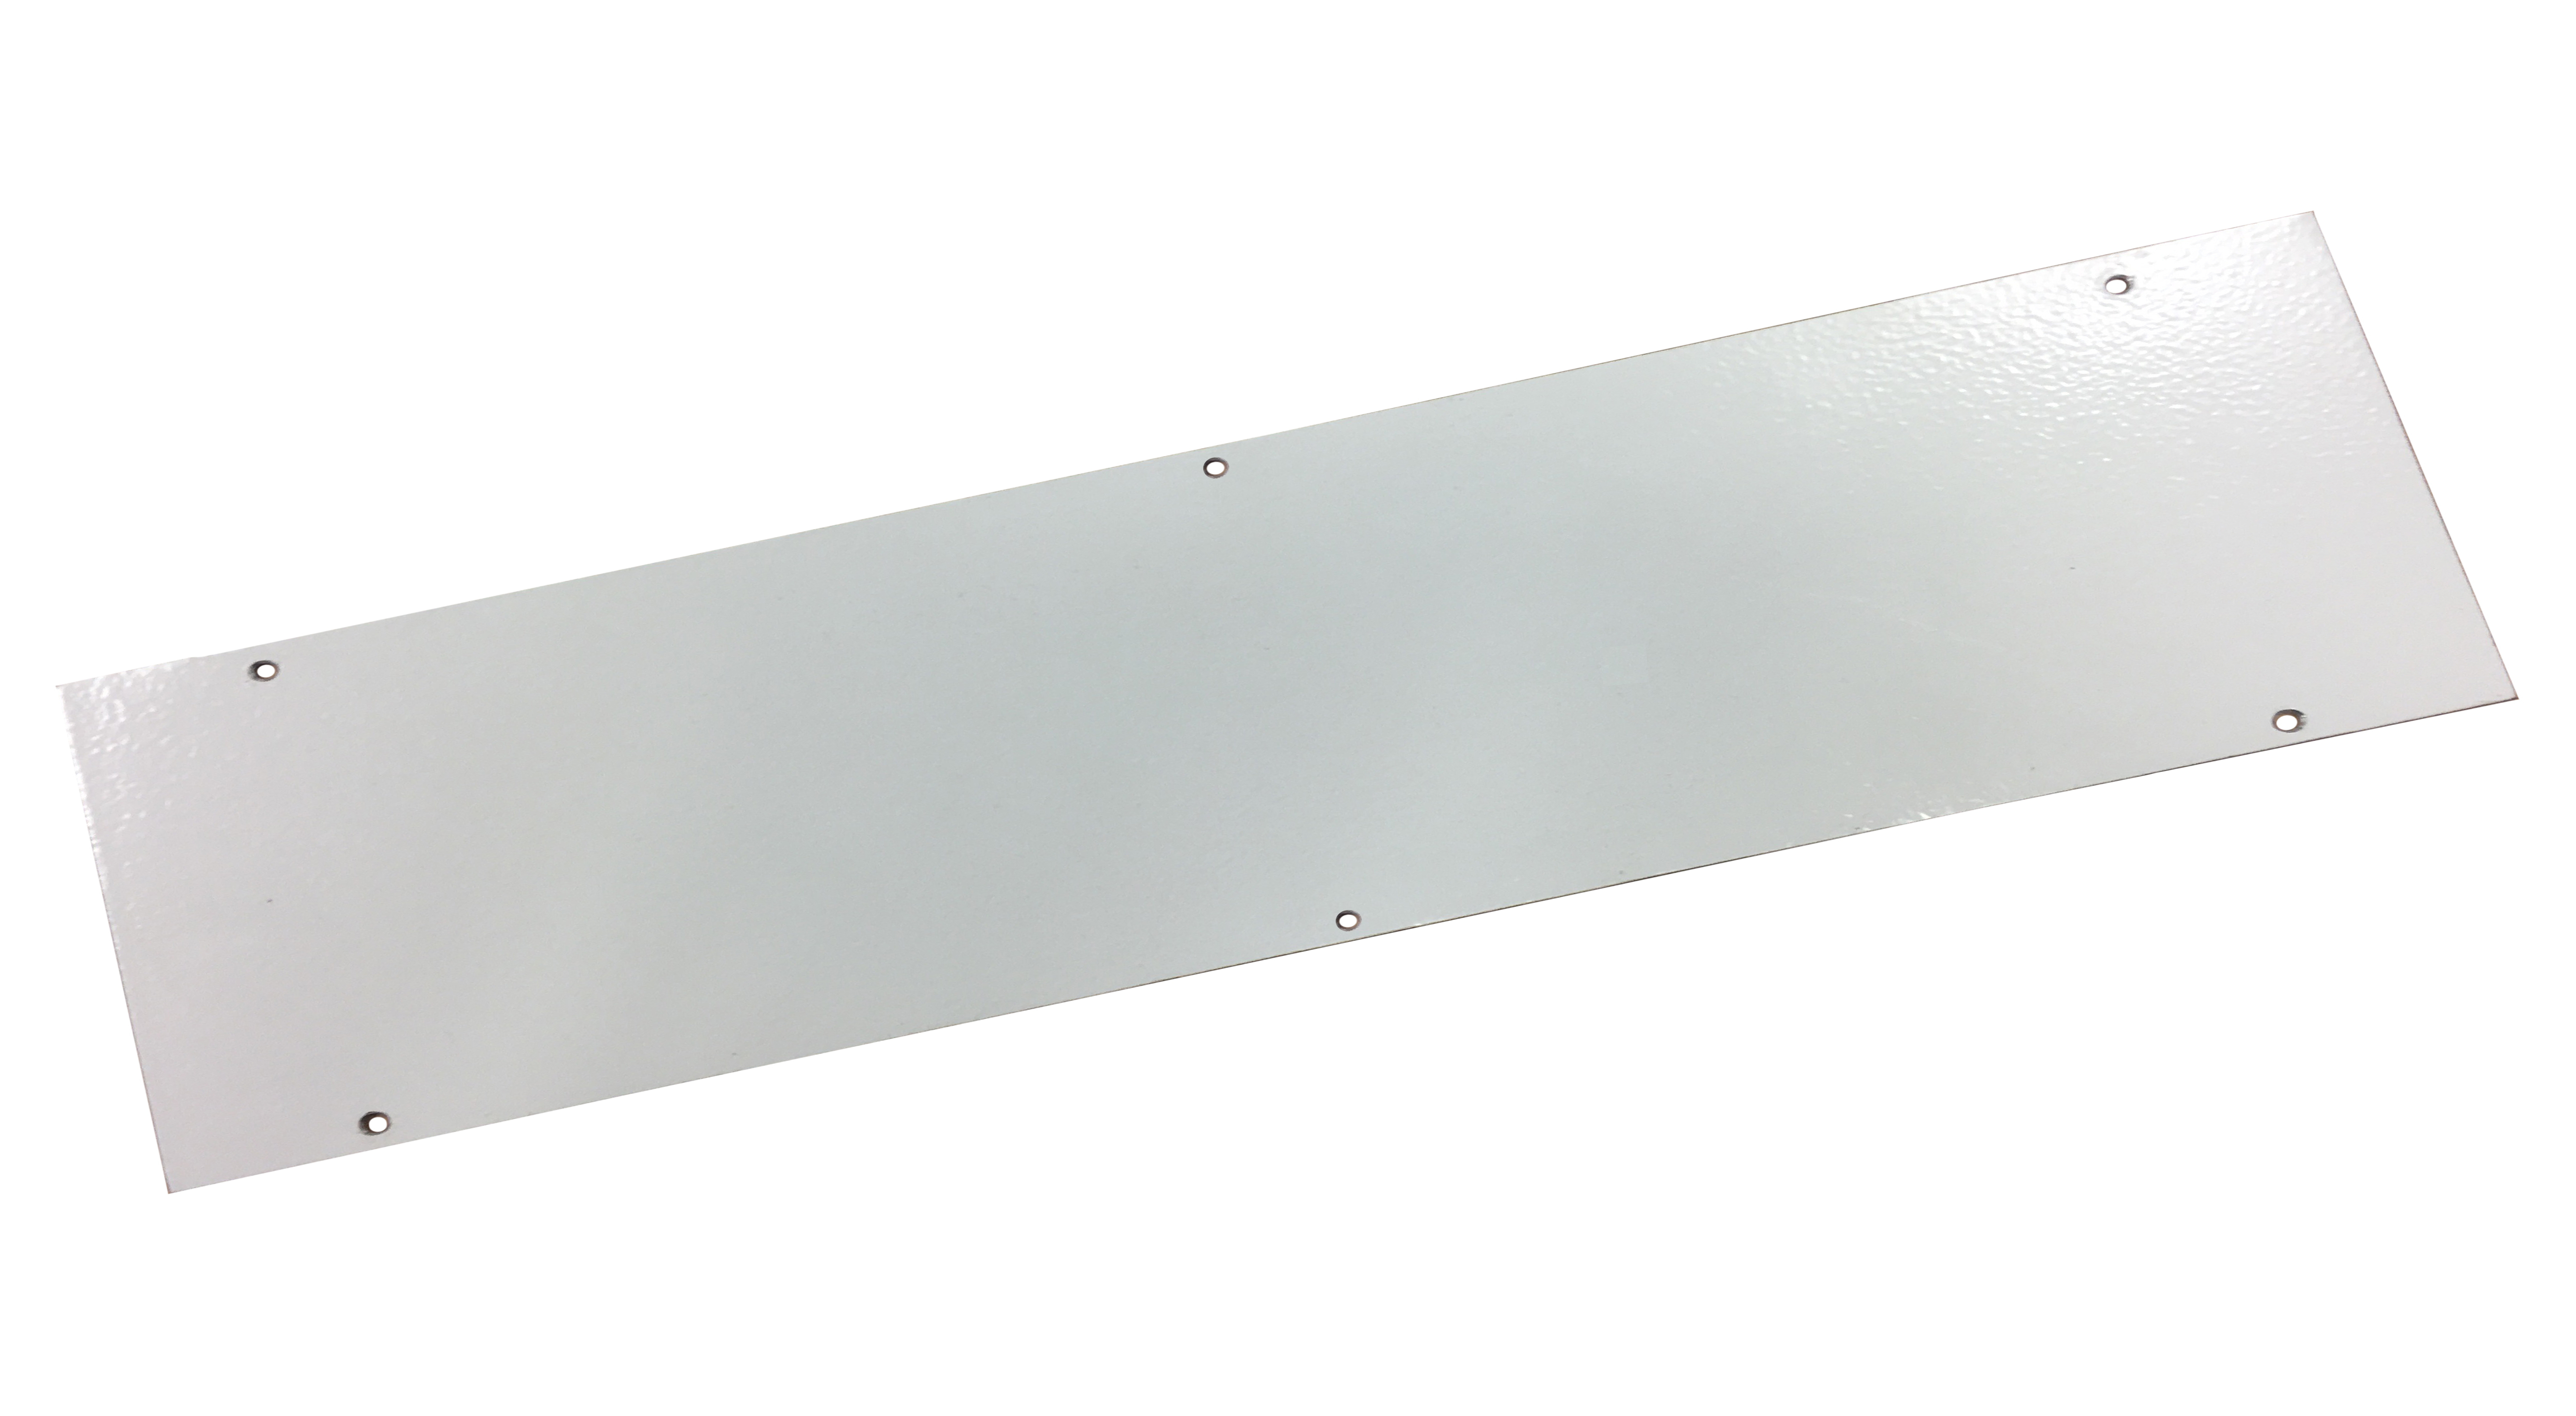 1 Stk Blindflansch IP20C, IL006/009/036 Sonder, 636x130x2mm IL900093--